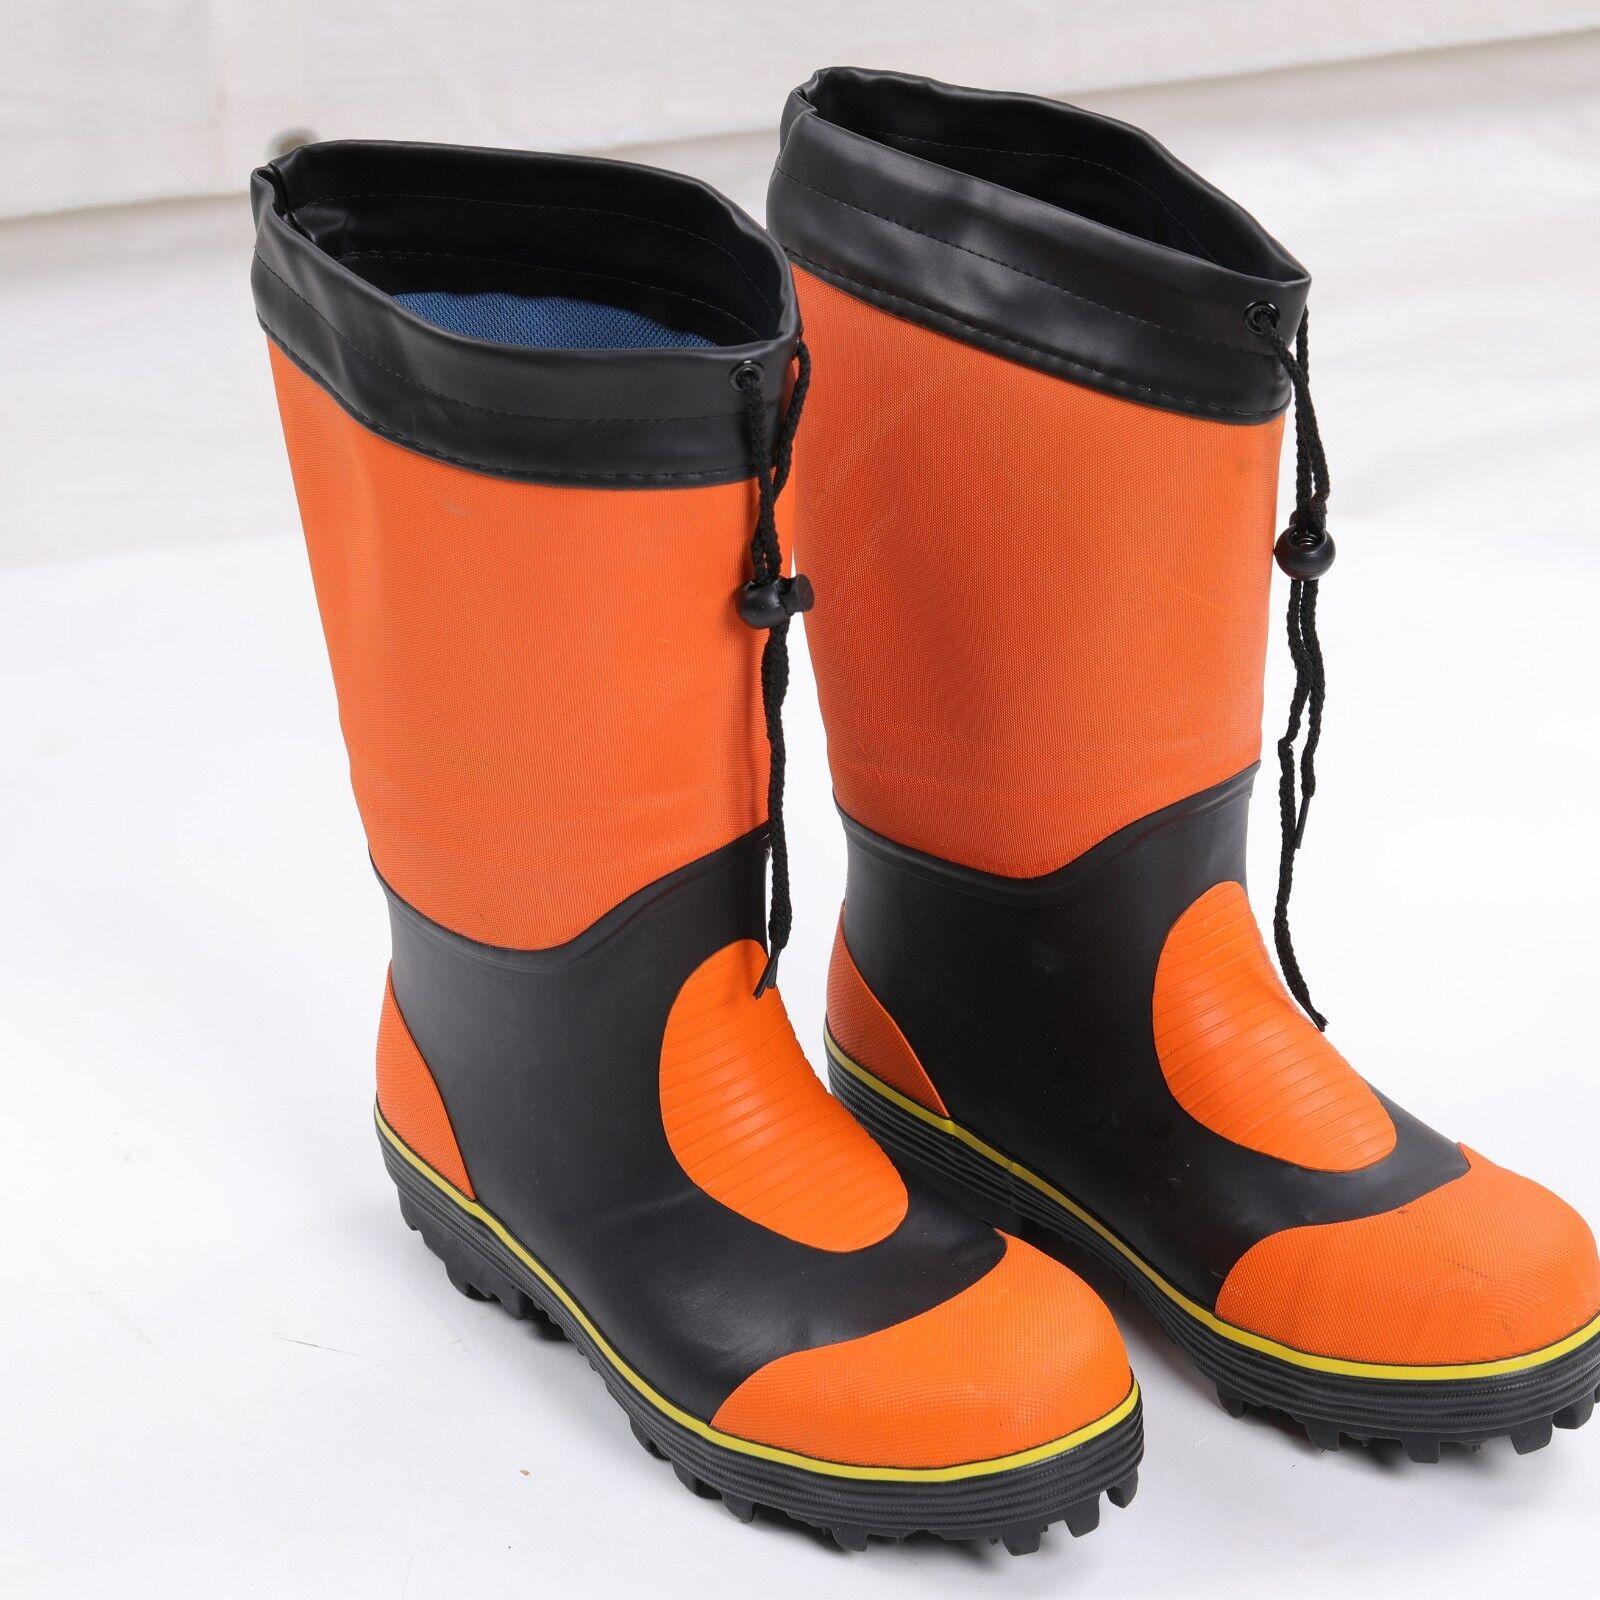 Outdoor Anti-skid Mud Waterproof Rain Boots Fishing Hiking shoes Rubber New